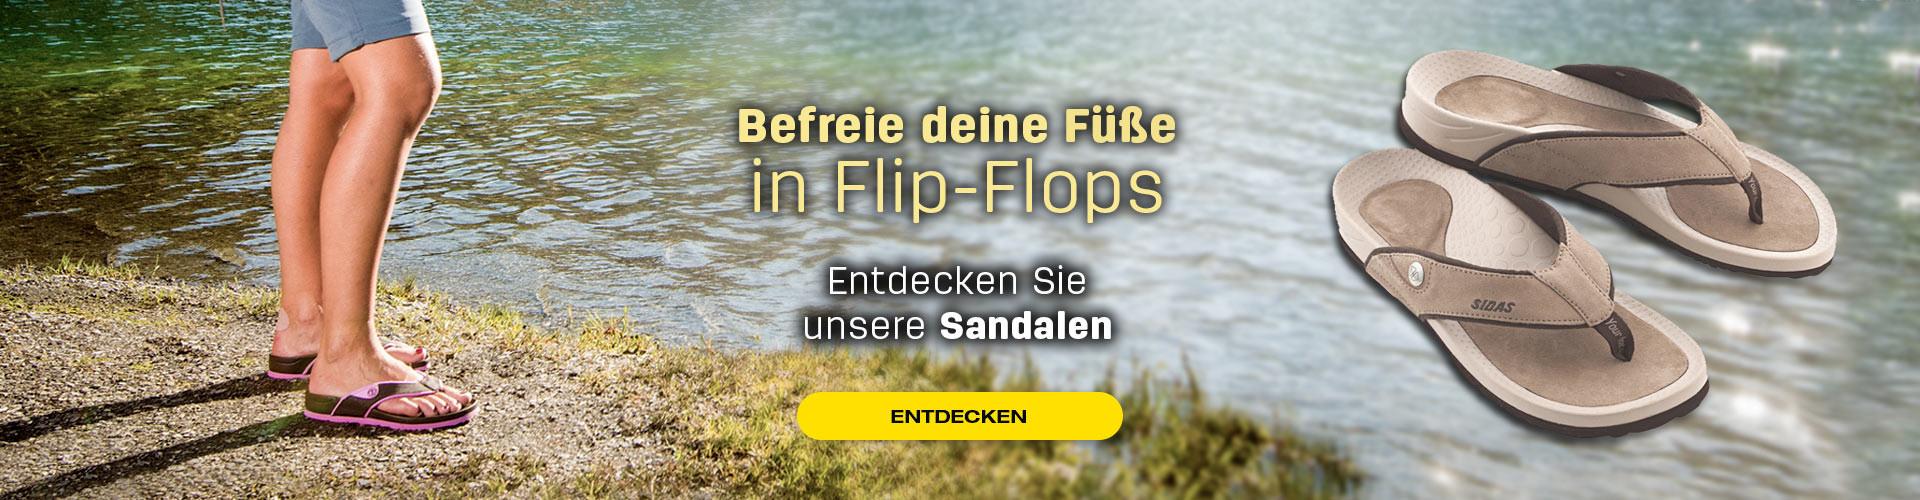 Befreie deine Füße in Flip-Flops!